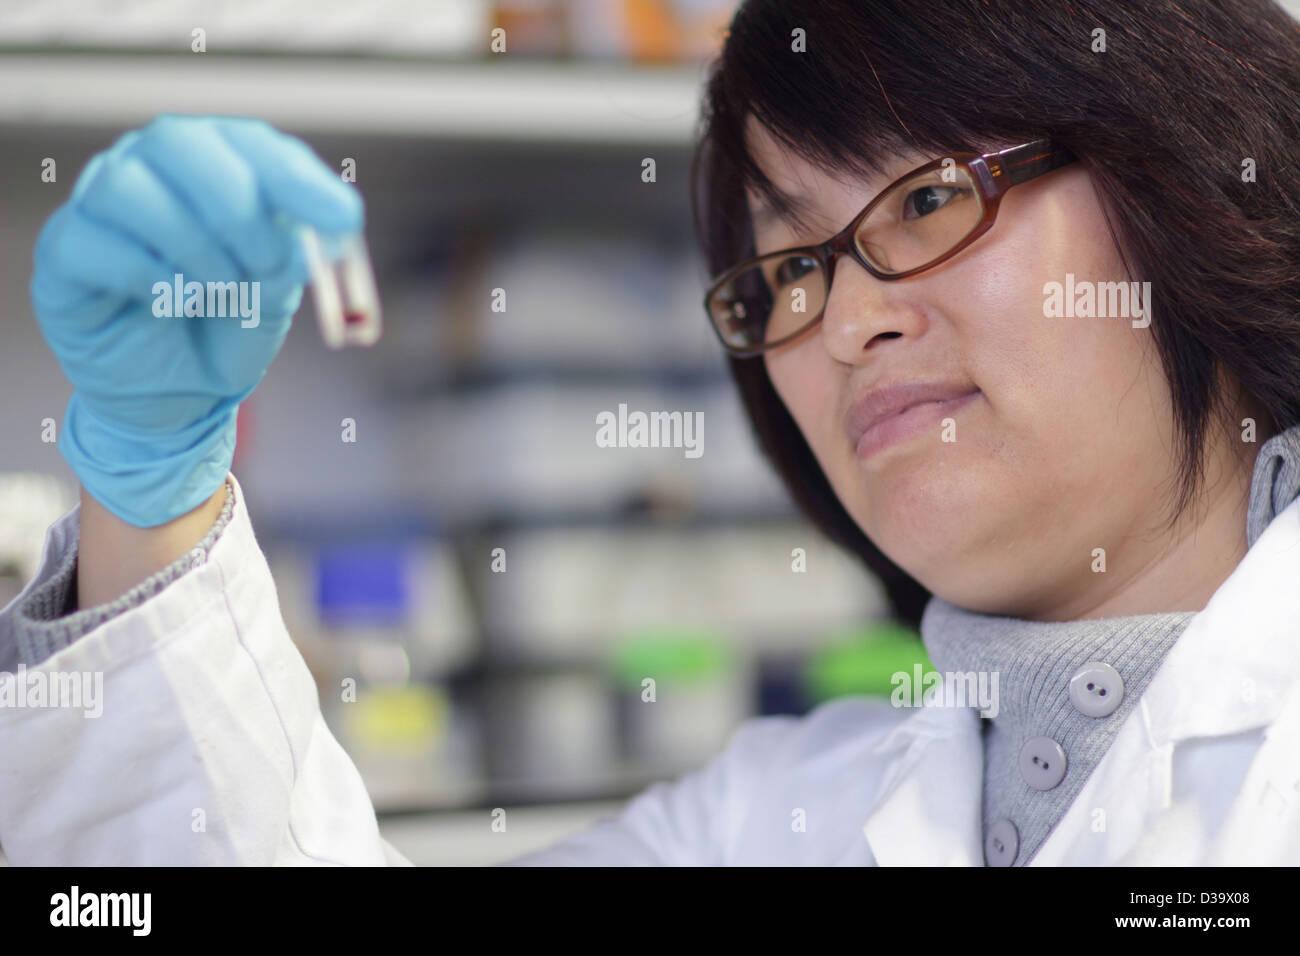 Scientist examining test tube in lab - Stock Image